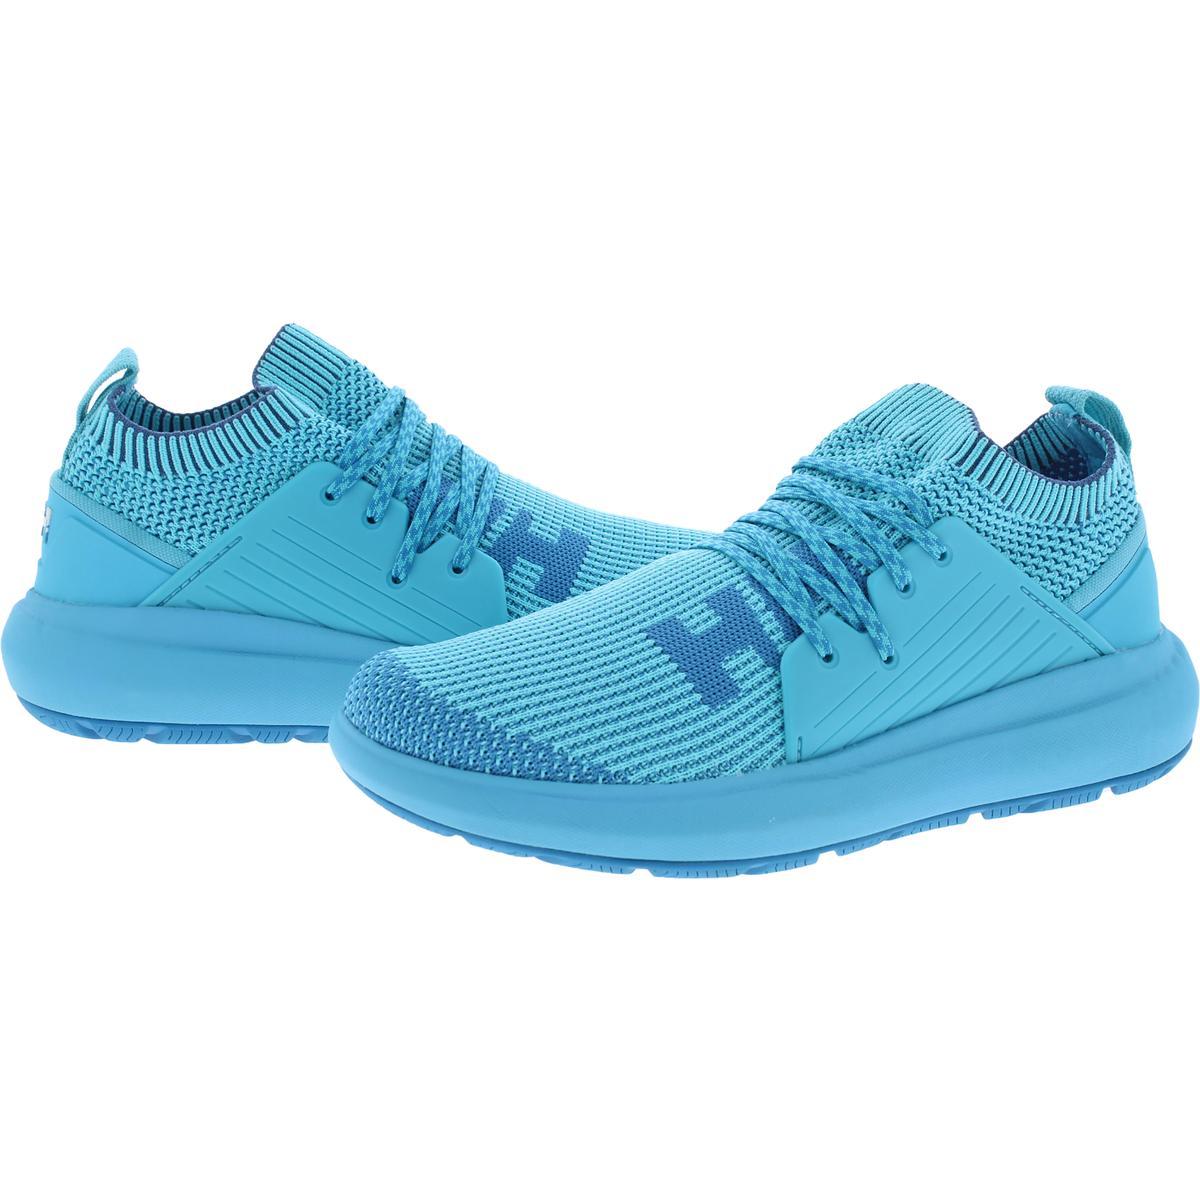 thumbnail 6 - Helly-Hansen-Womens-Razorskiff-Knit-Breathable-Fashion-Sneakers-Shoes-BHFO-8932